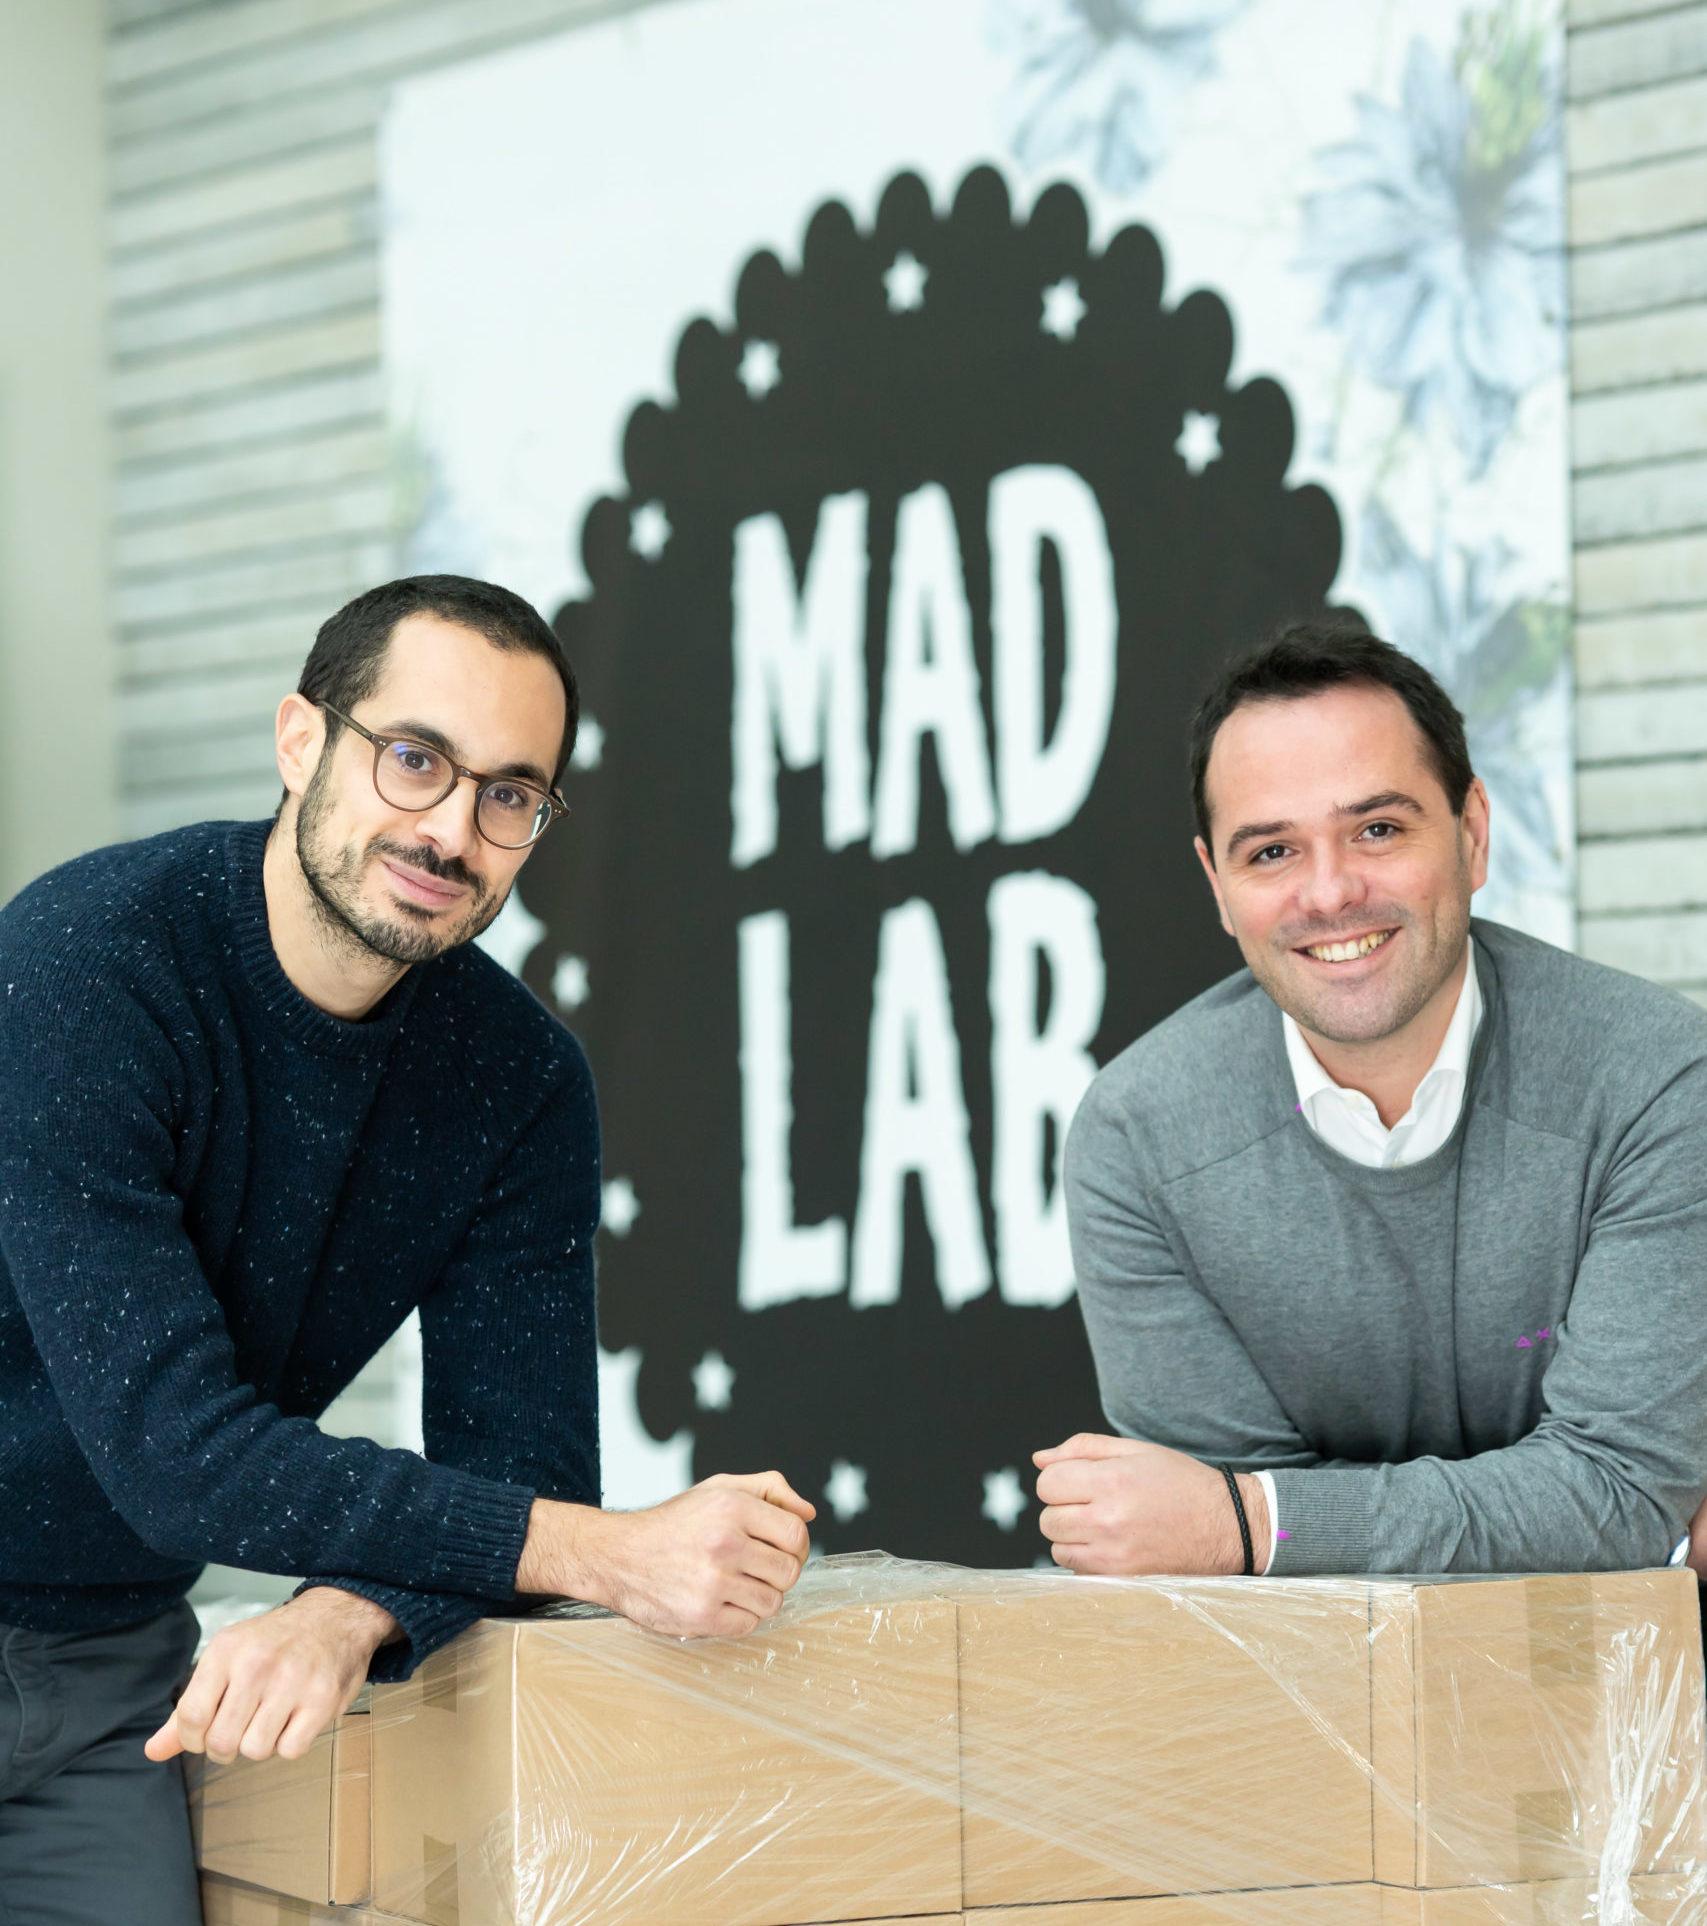 Mad Lab - Photo de l'équipe